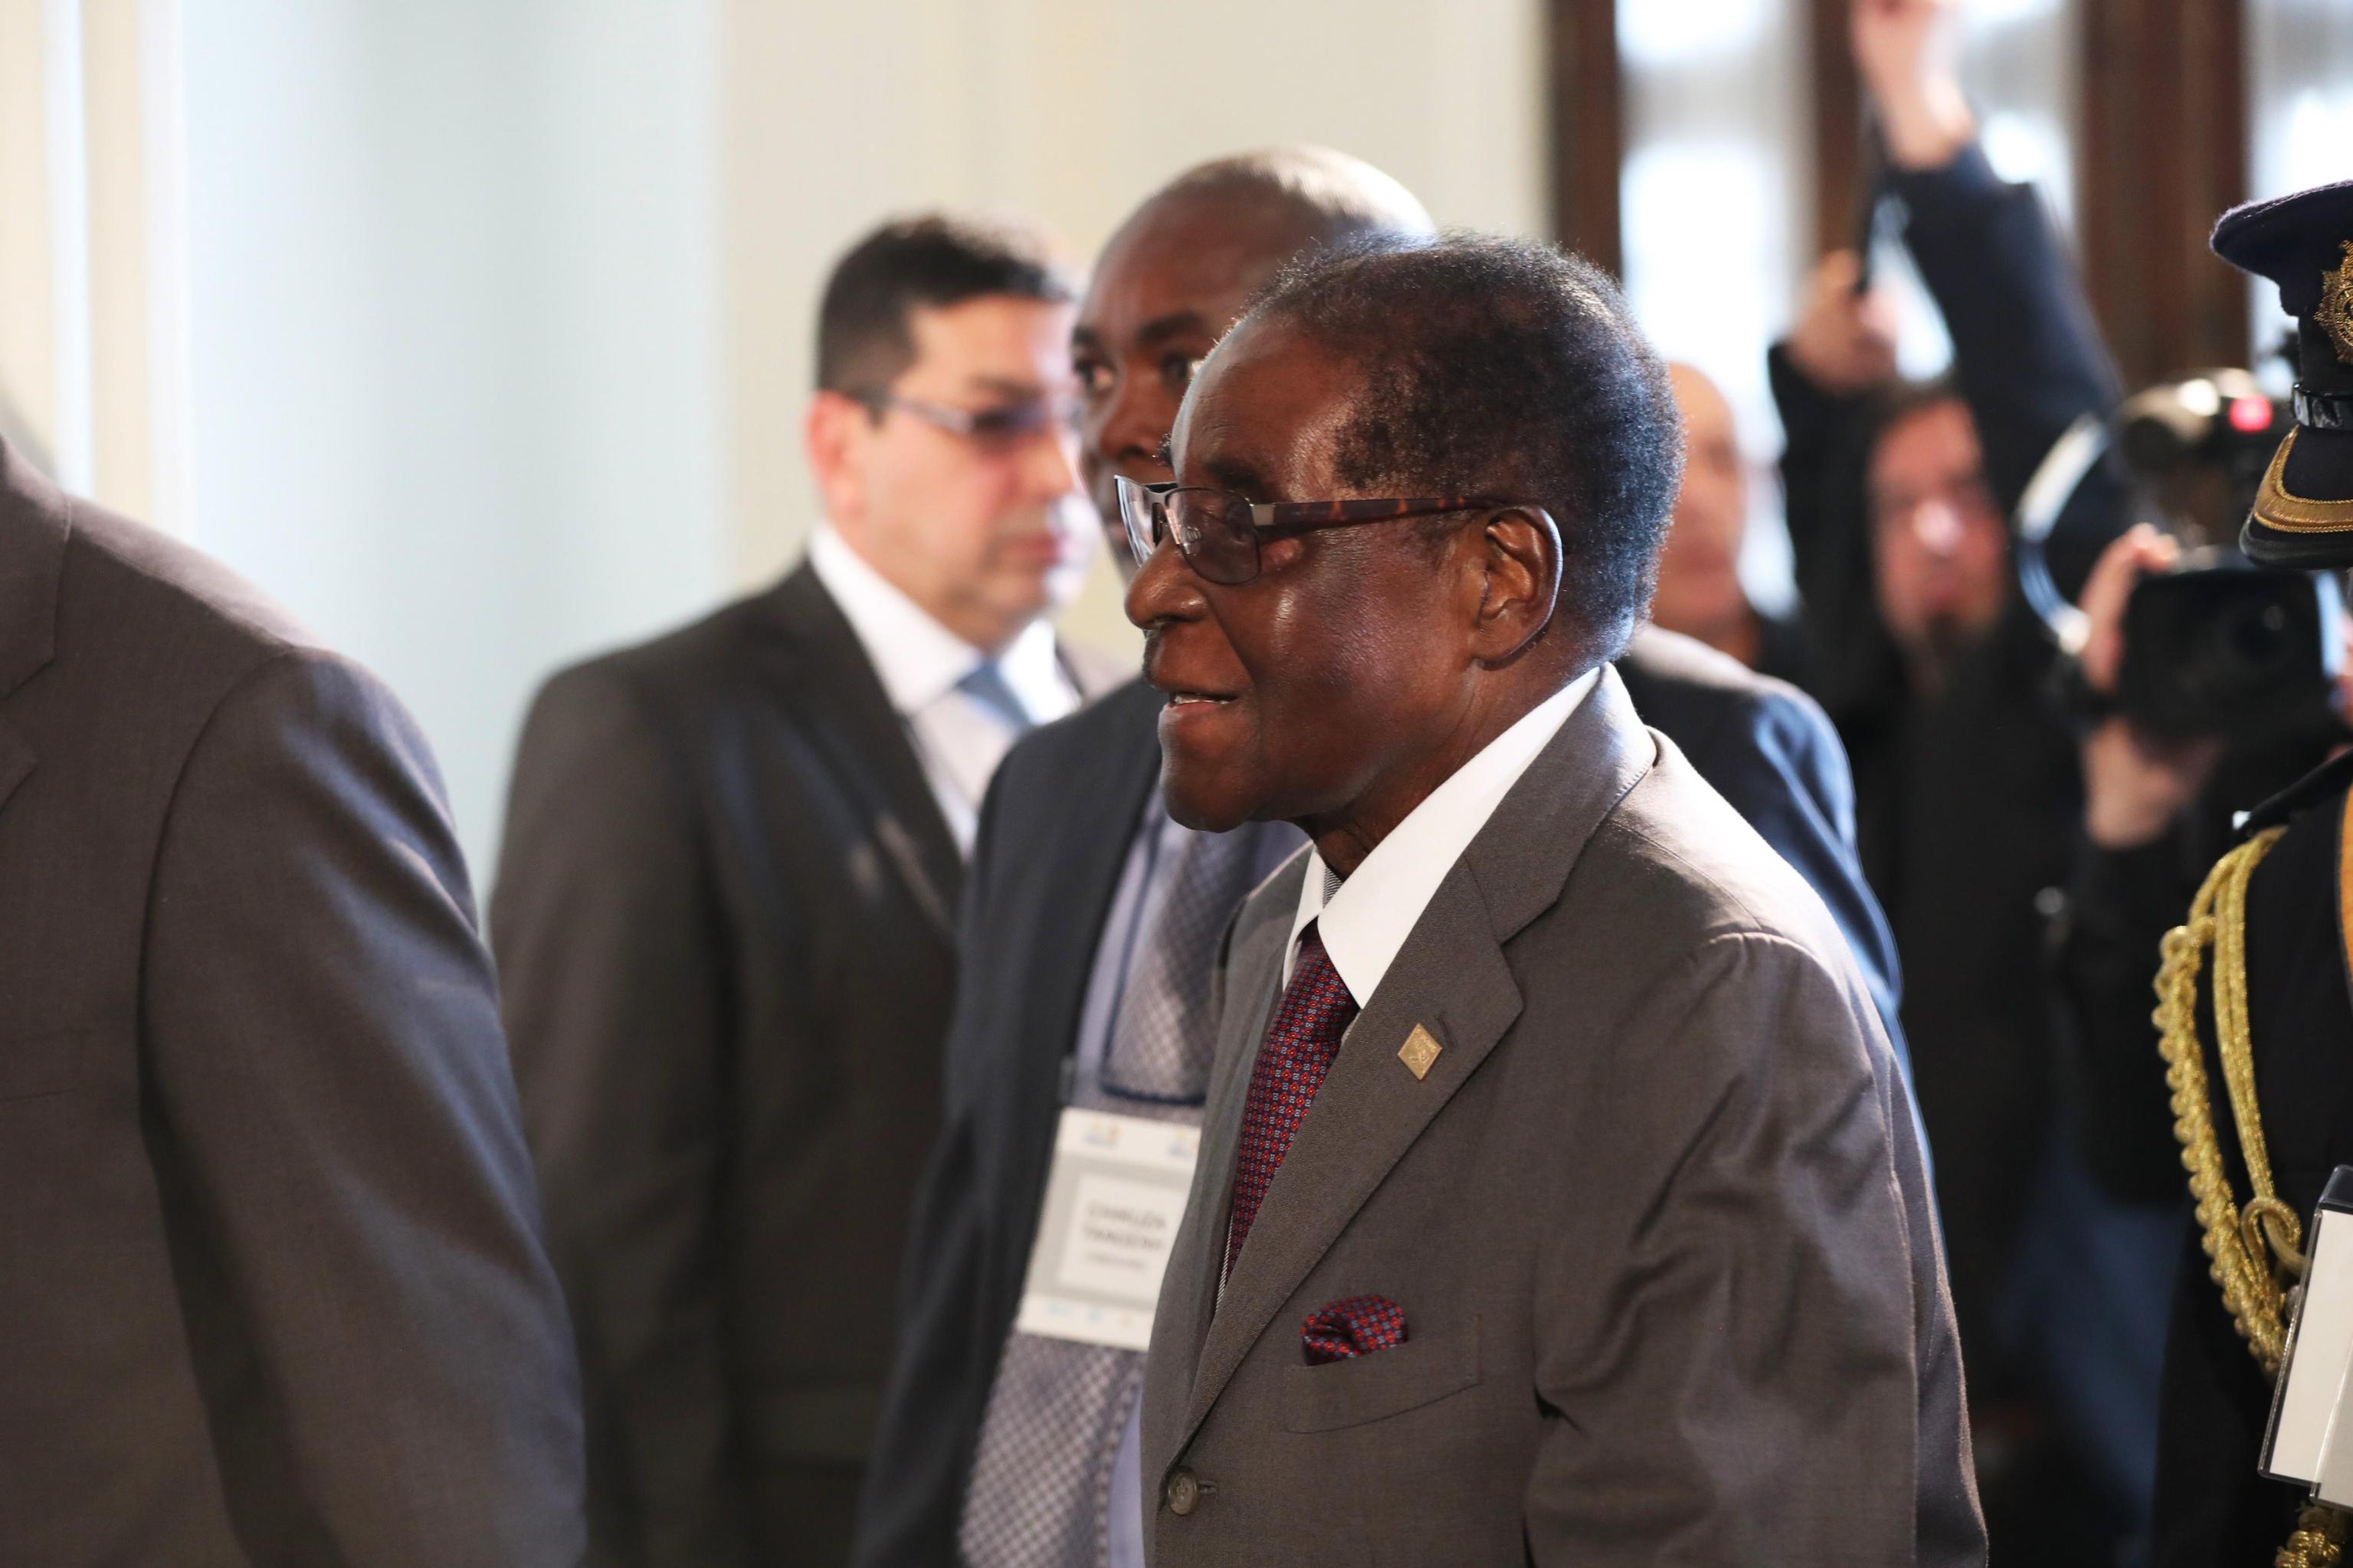 Media, Mugabe accetta di dimettersi